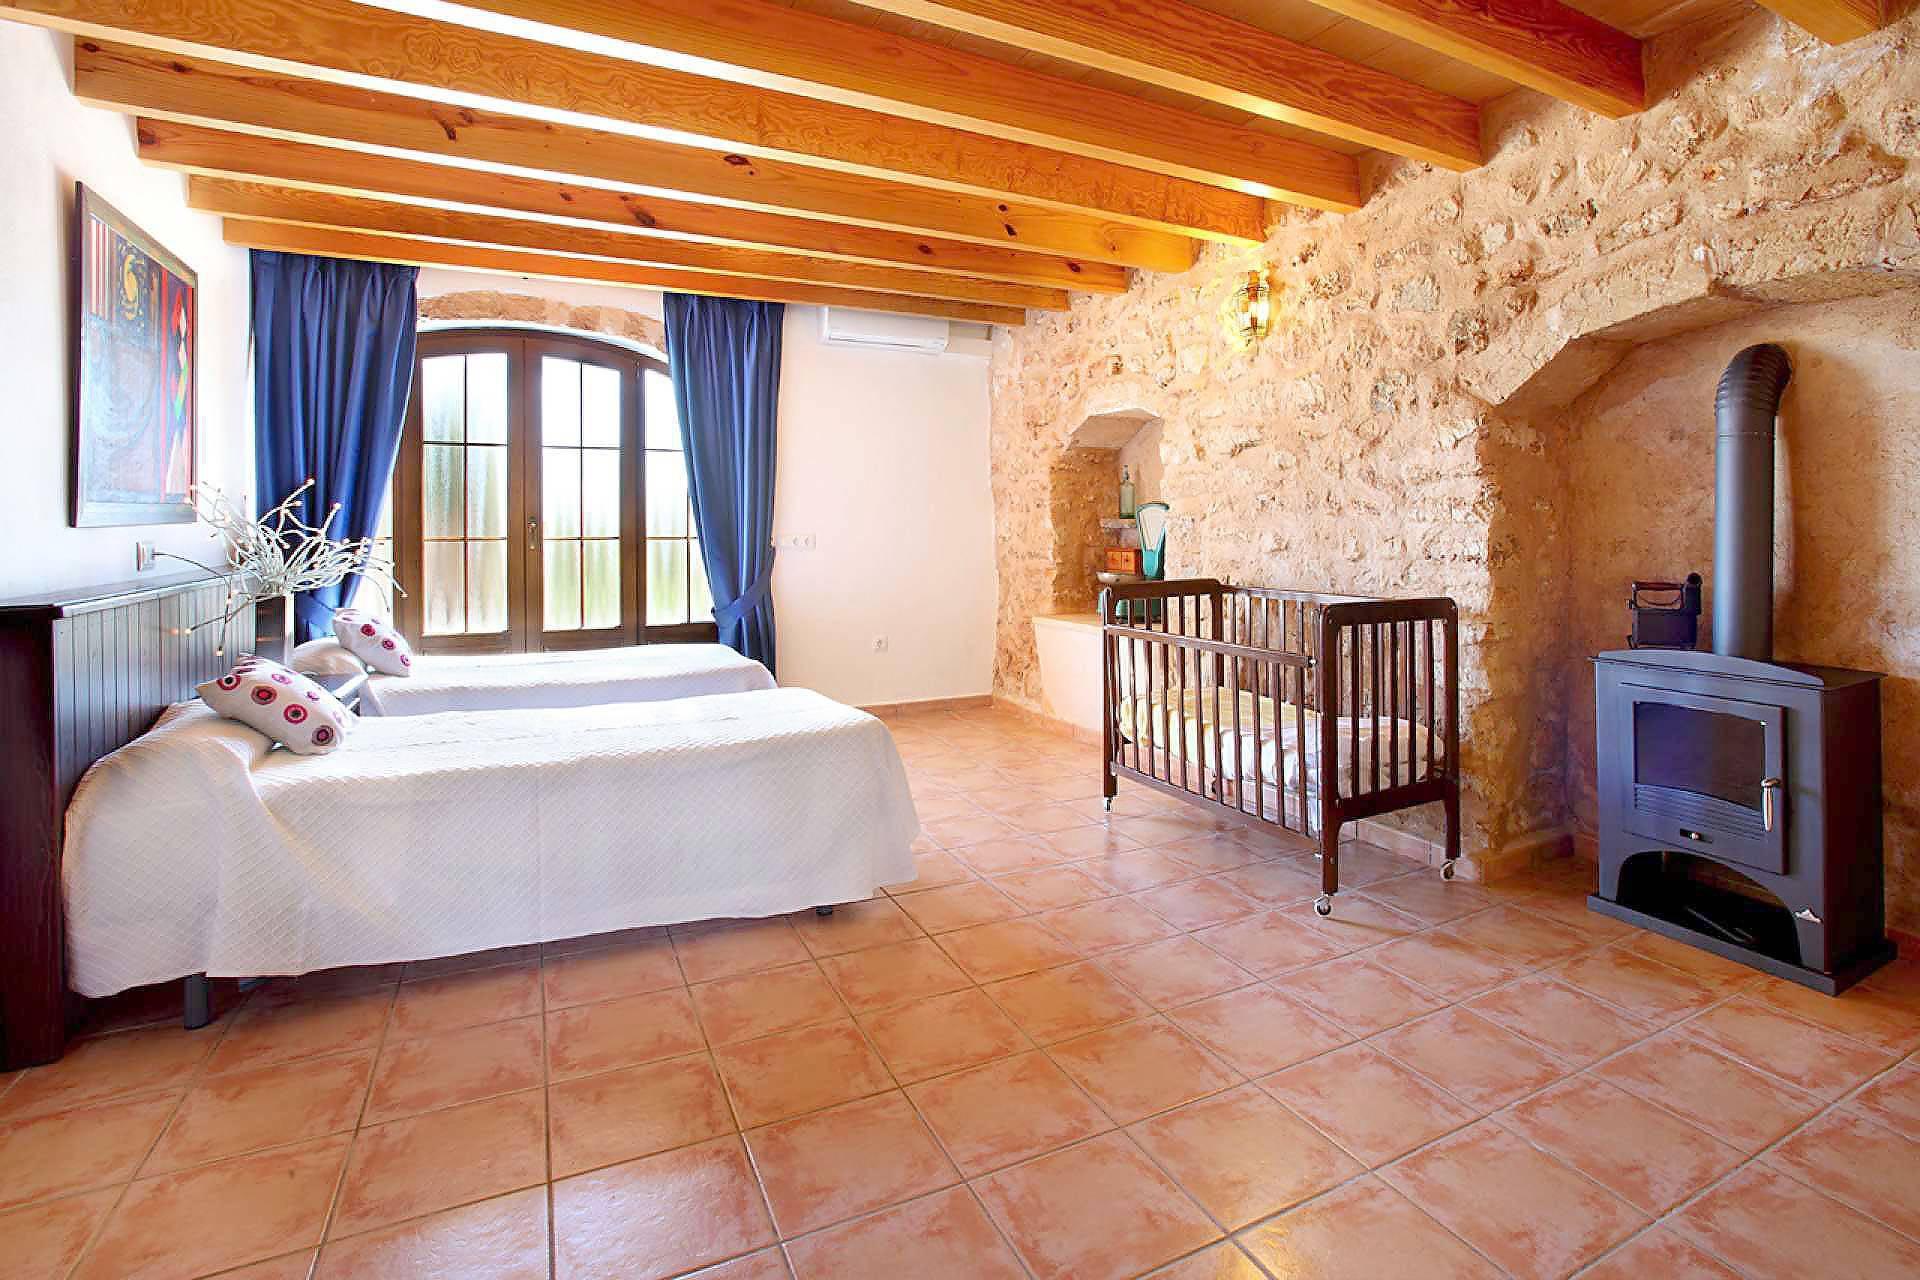 01-33 Großzügiges Ferienhaus Mallorca Osten Bild 21